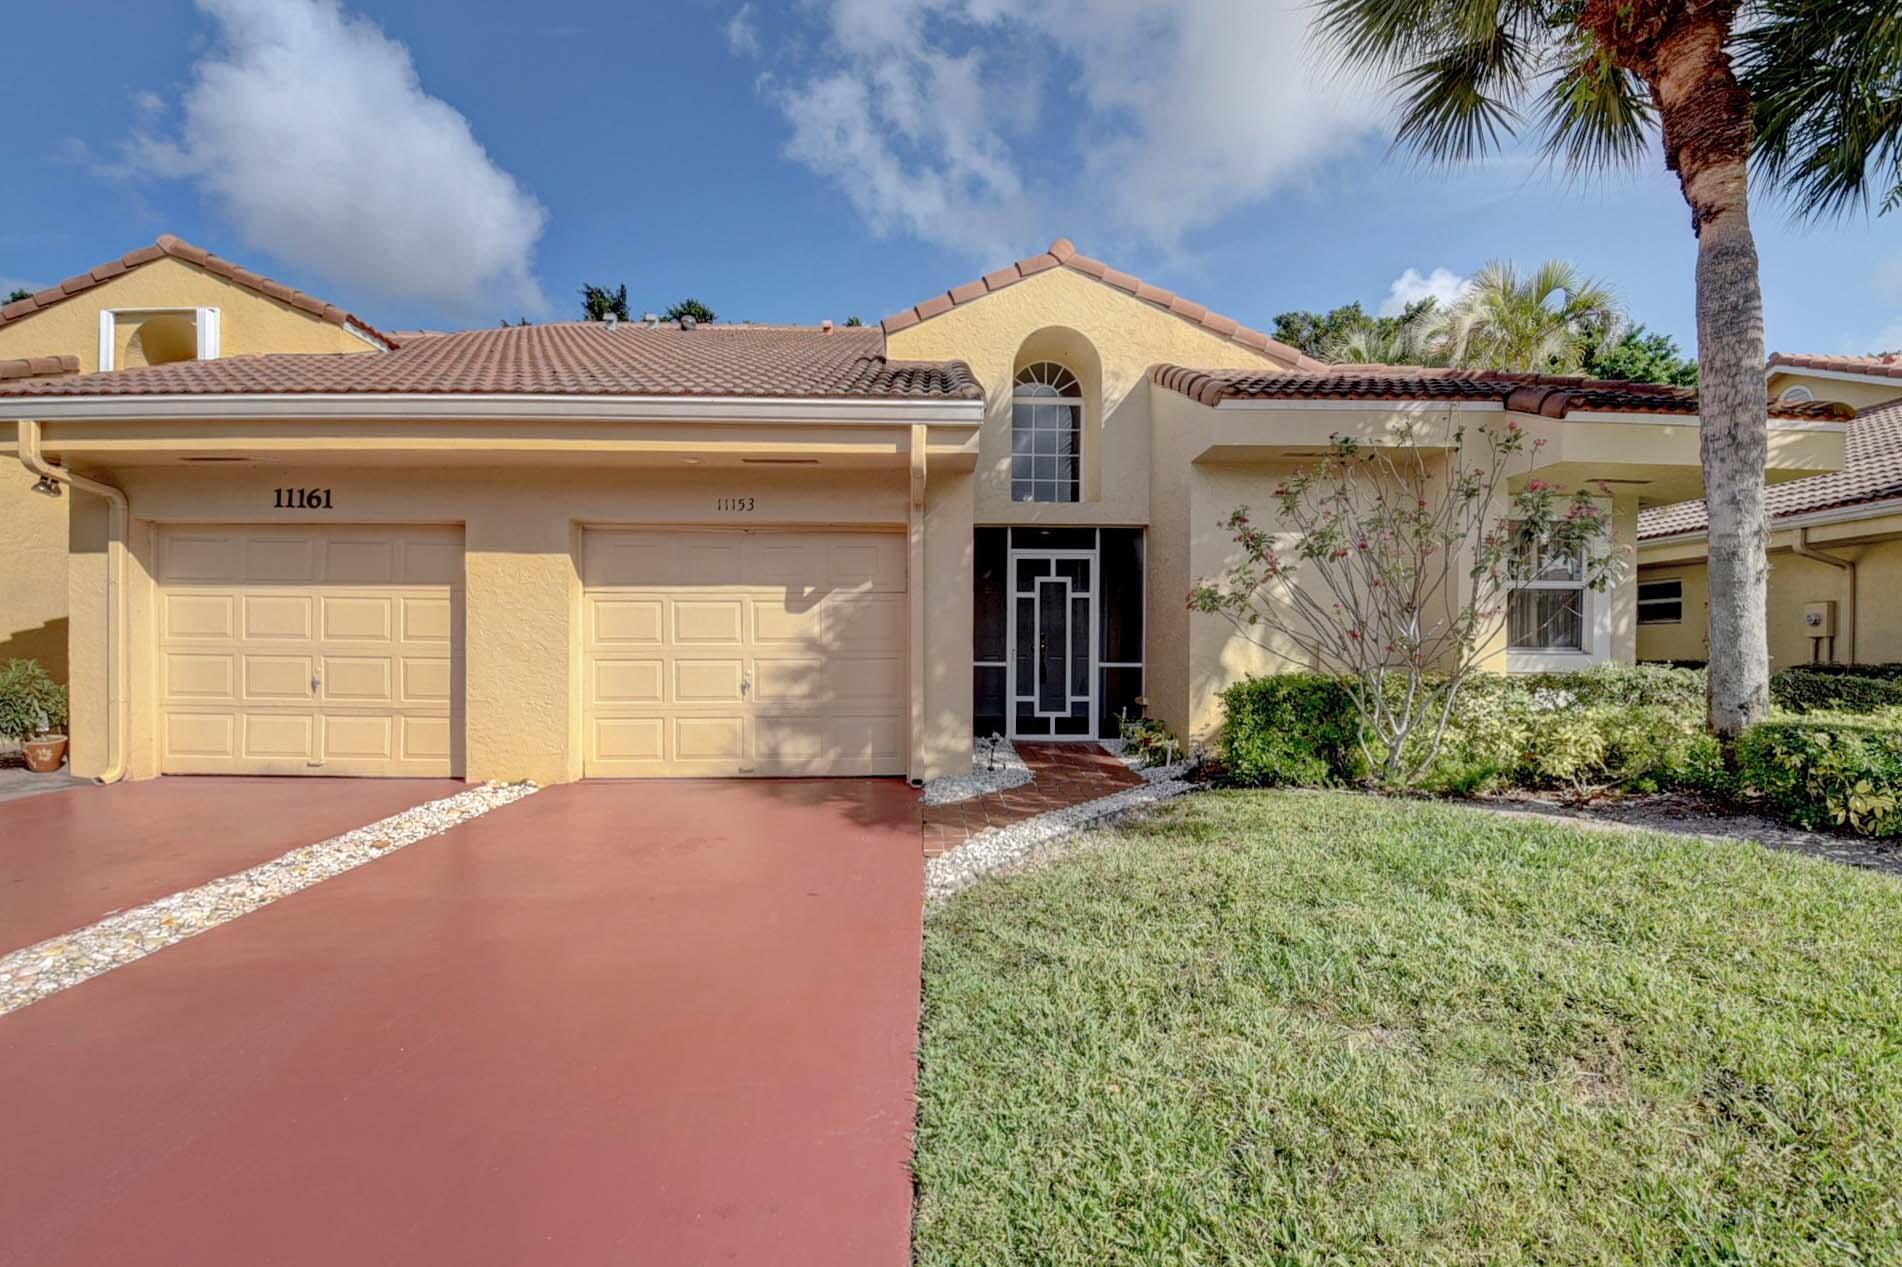 11153  Sangria Court  For Sale 10706150, FL